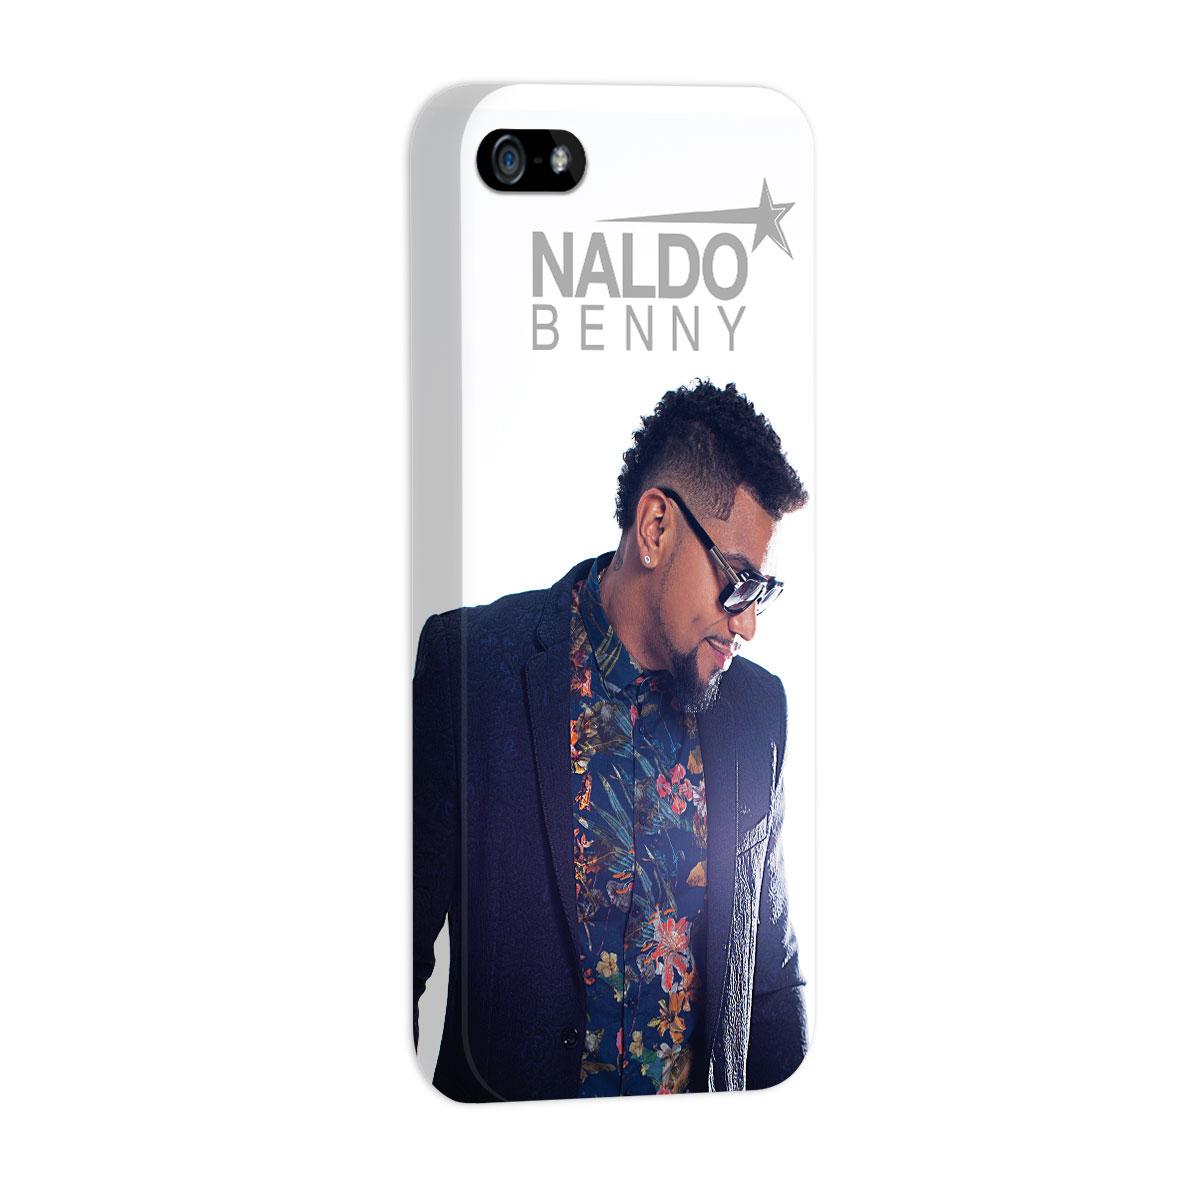 Capa para iPhone 5/5S Naldo Benny Photo